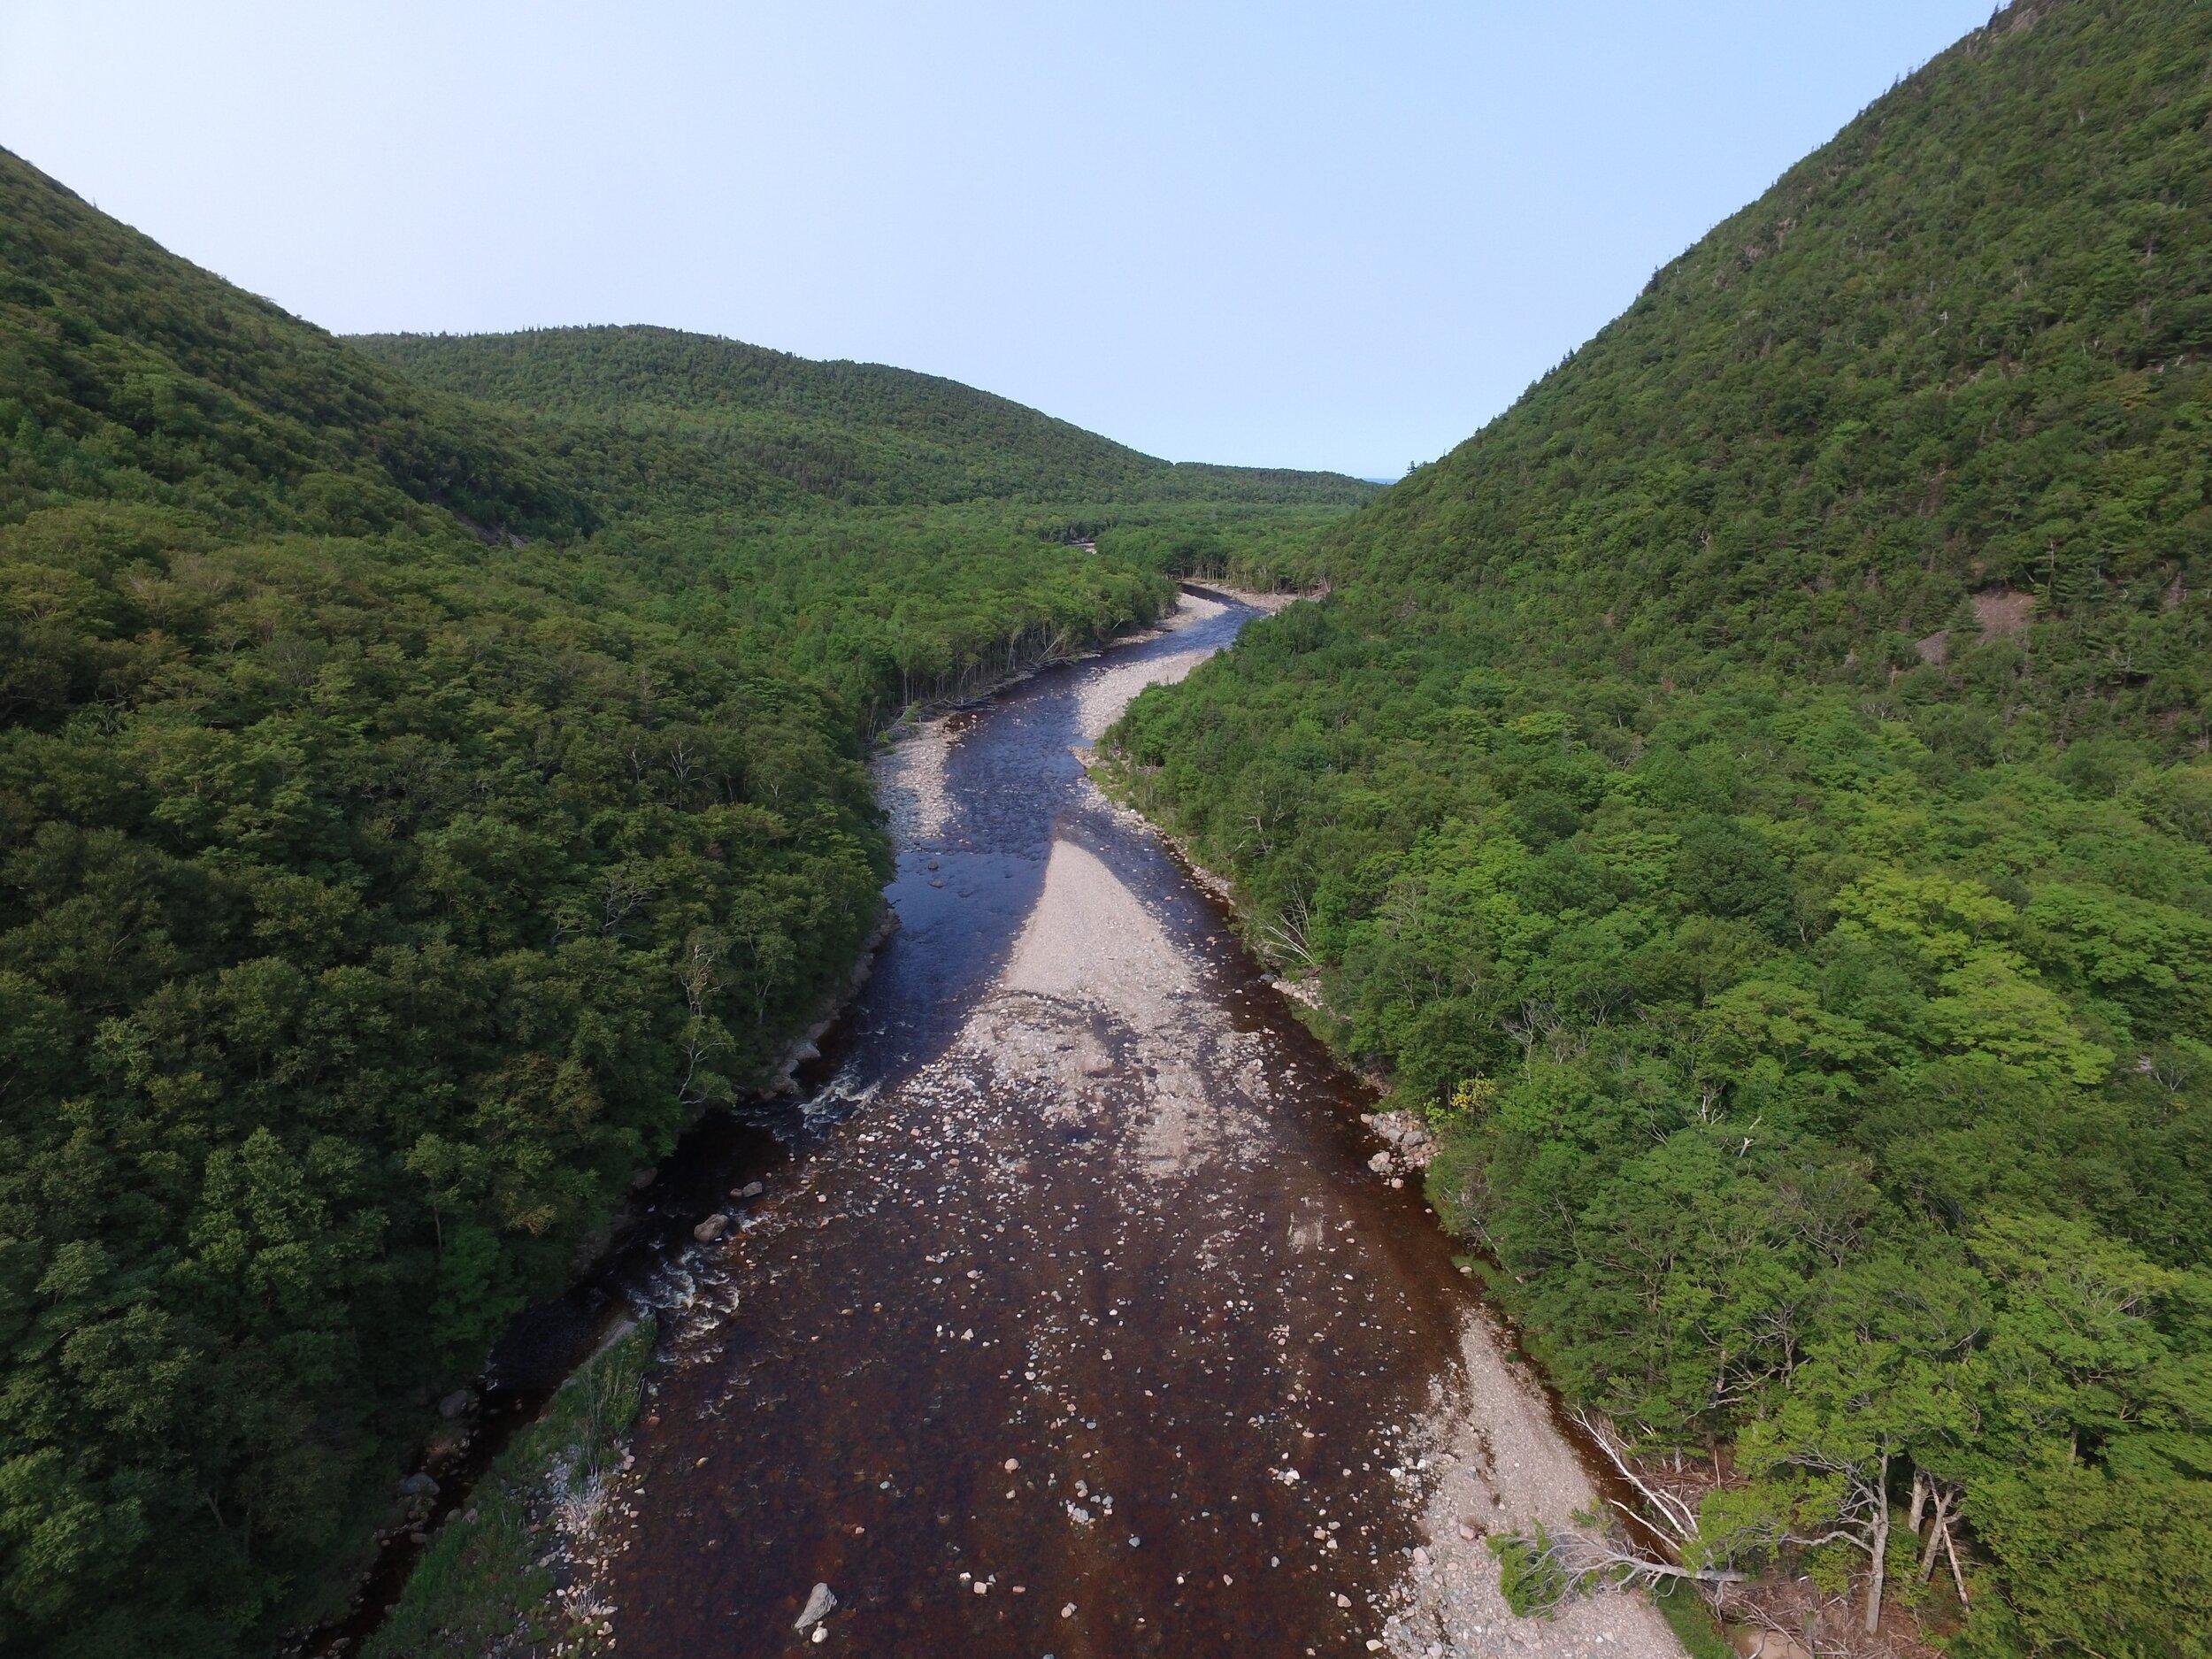 Above Fence Pool, upper rock retarding bars, east bank, looking downstream - AFTER.jpg